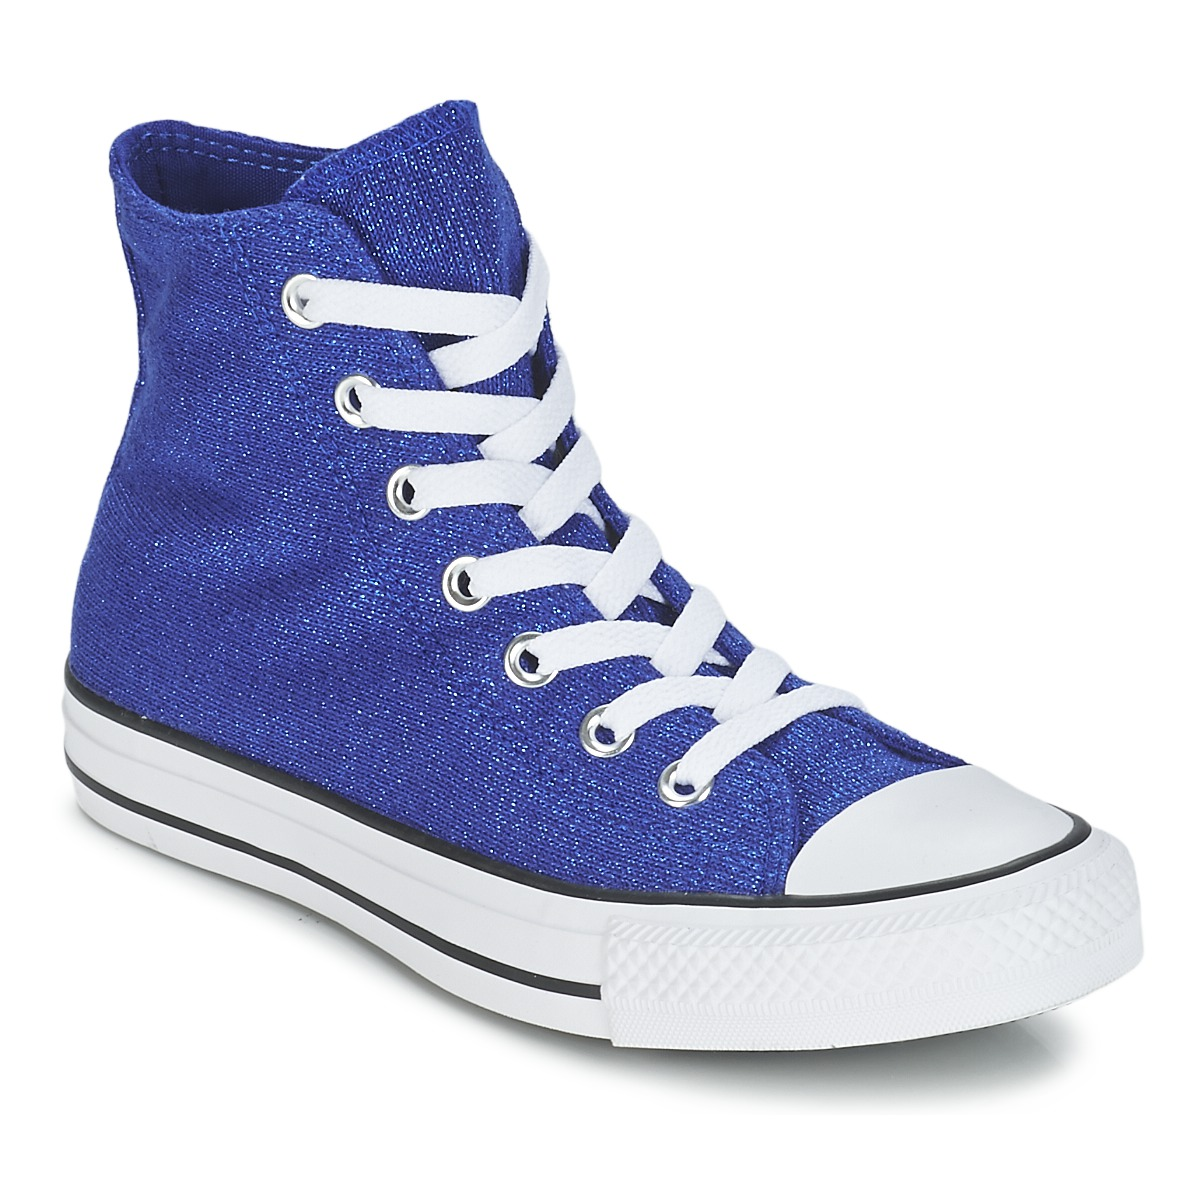 Basket montante Converse CHUCK TAYLOR ALL STAR KNIT Bleu roi